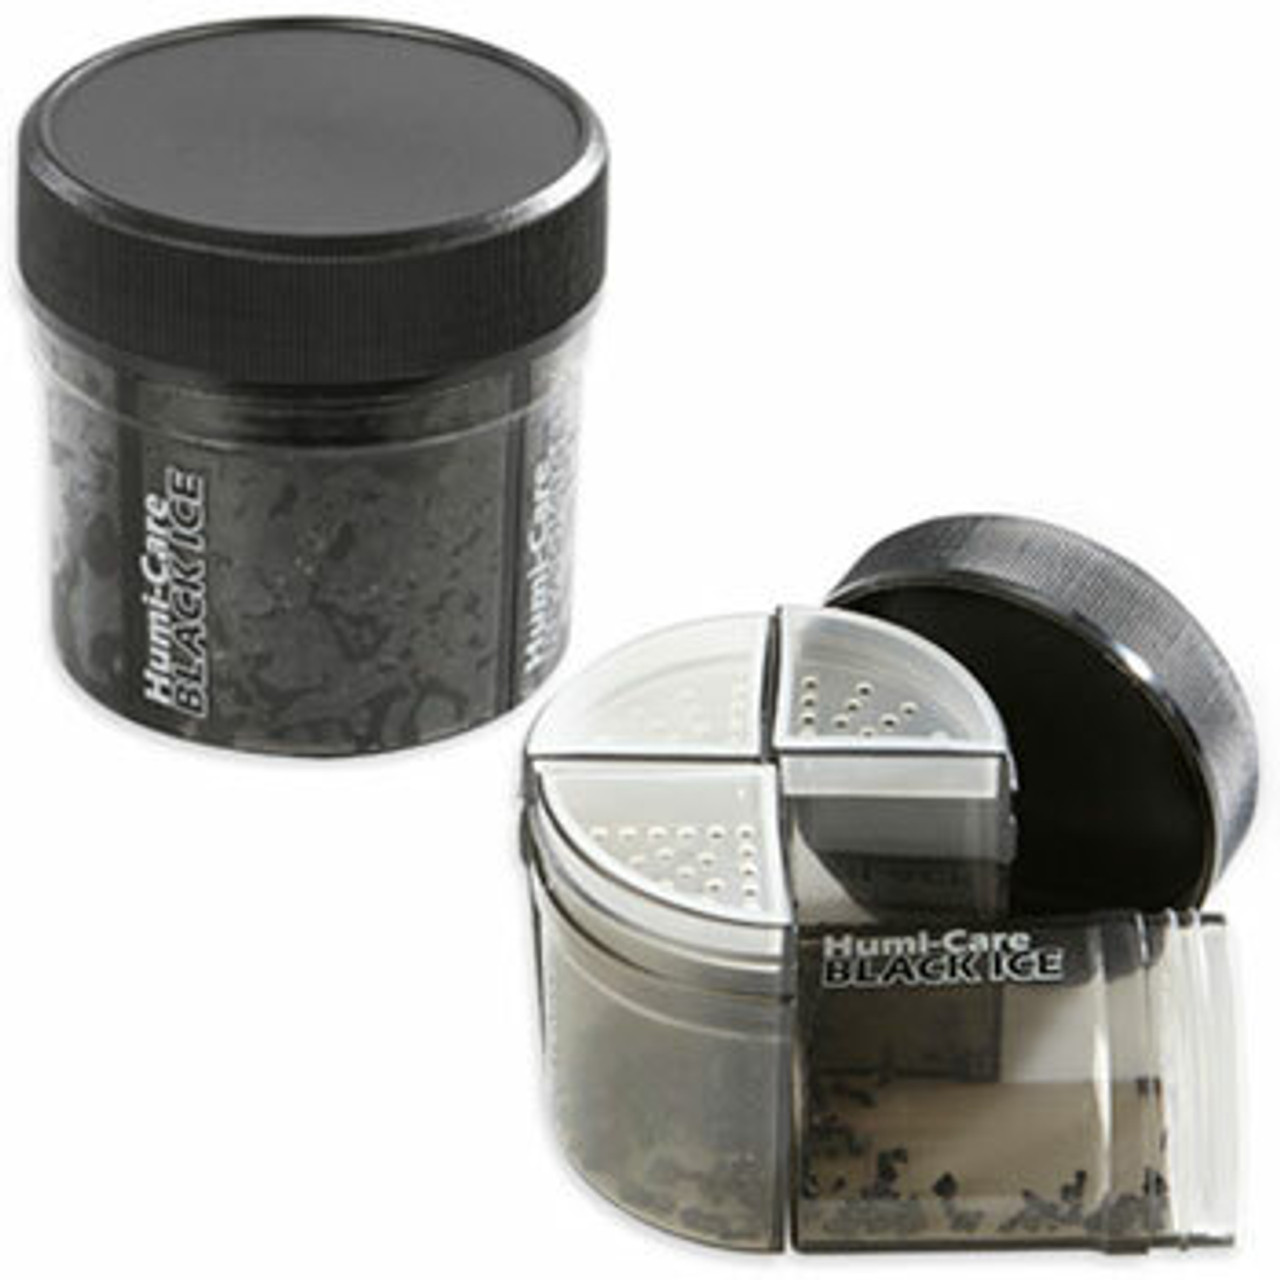 Humi-Care Black Ice Cigar Humidifier 8oz